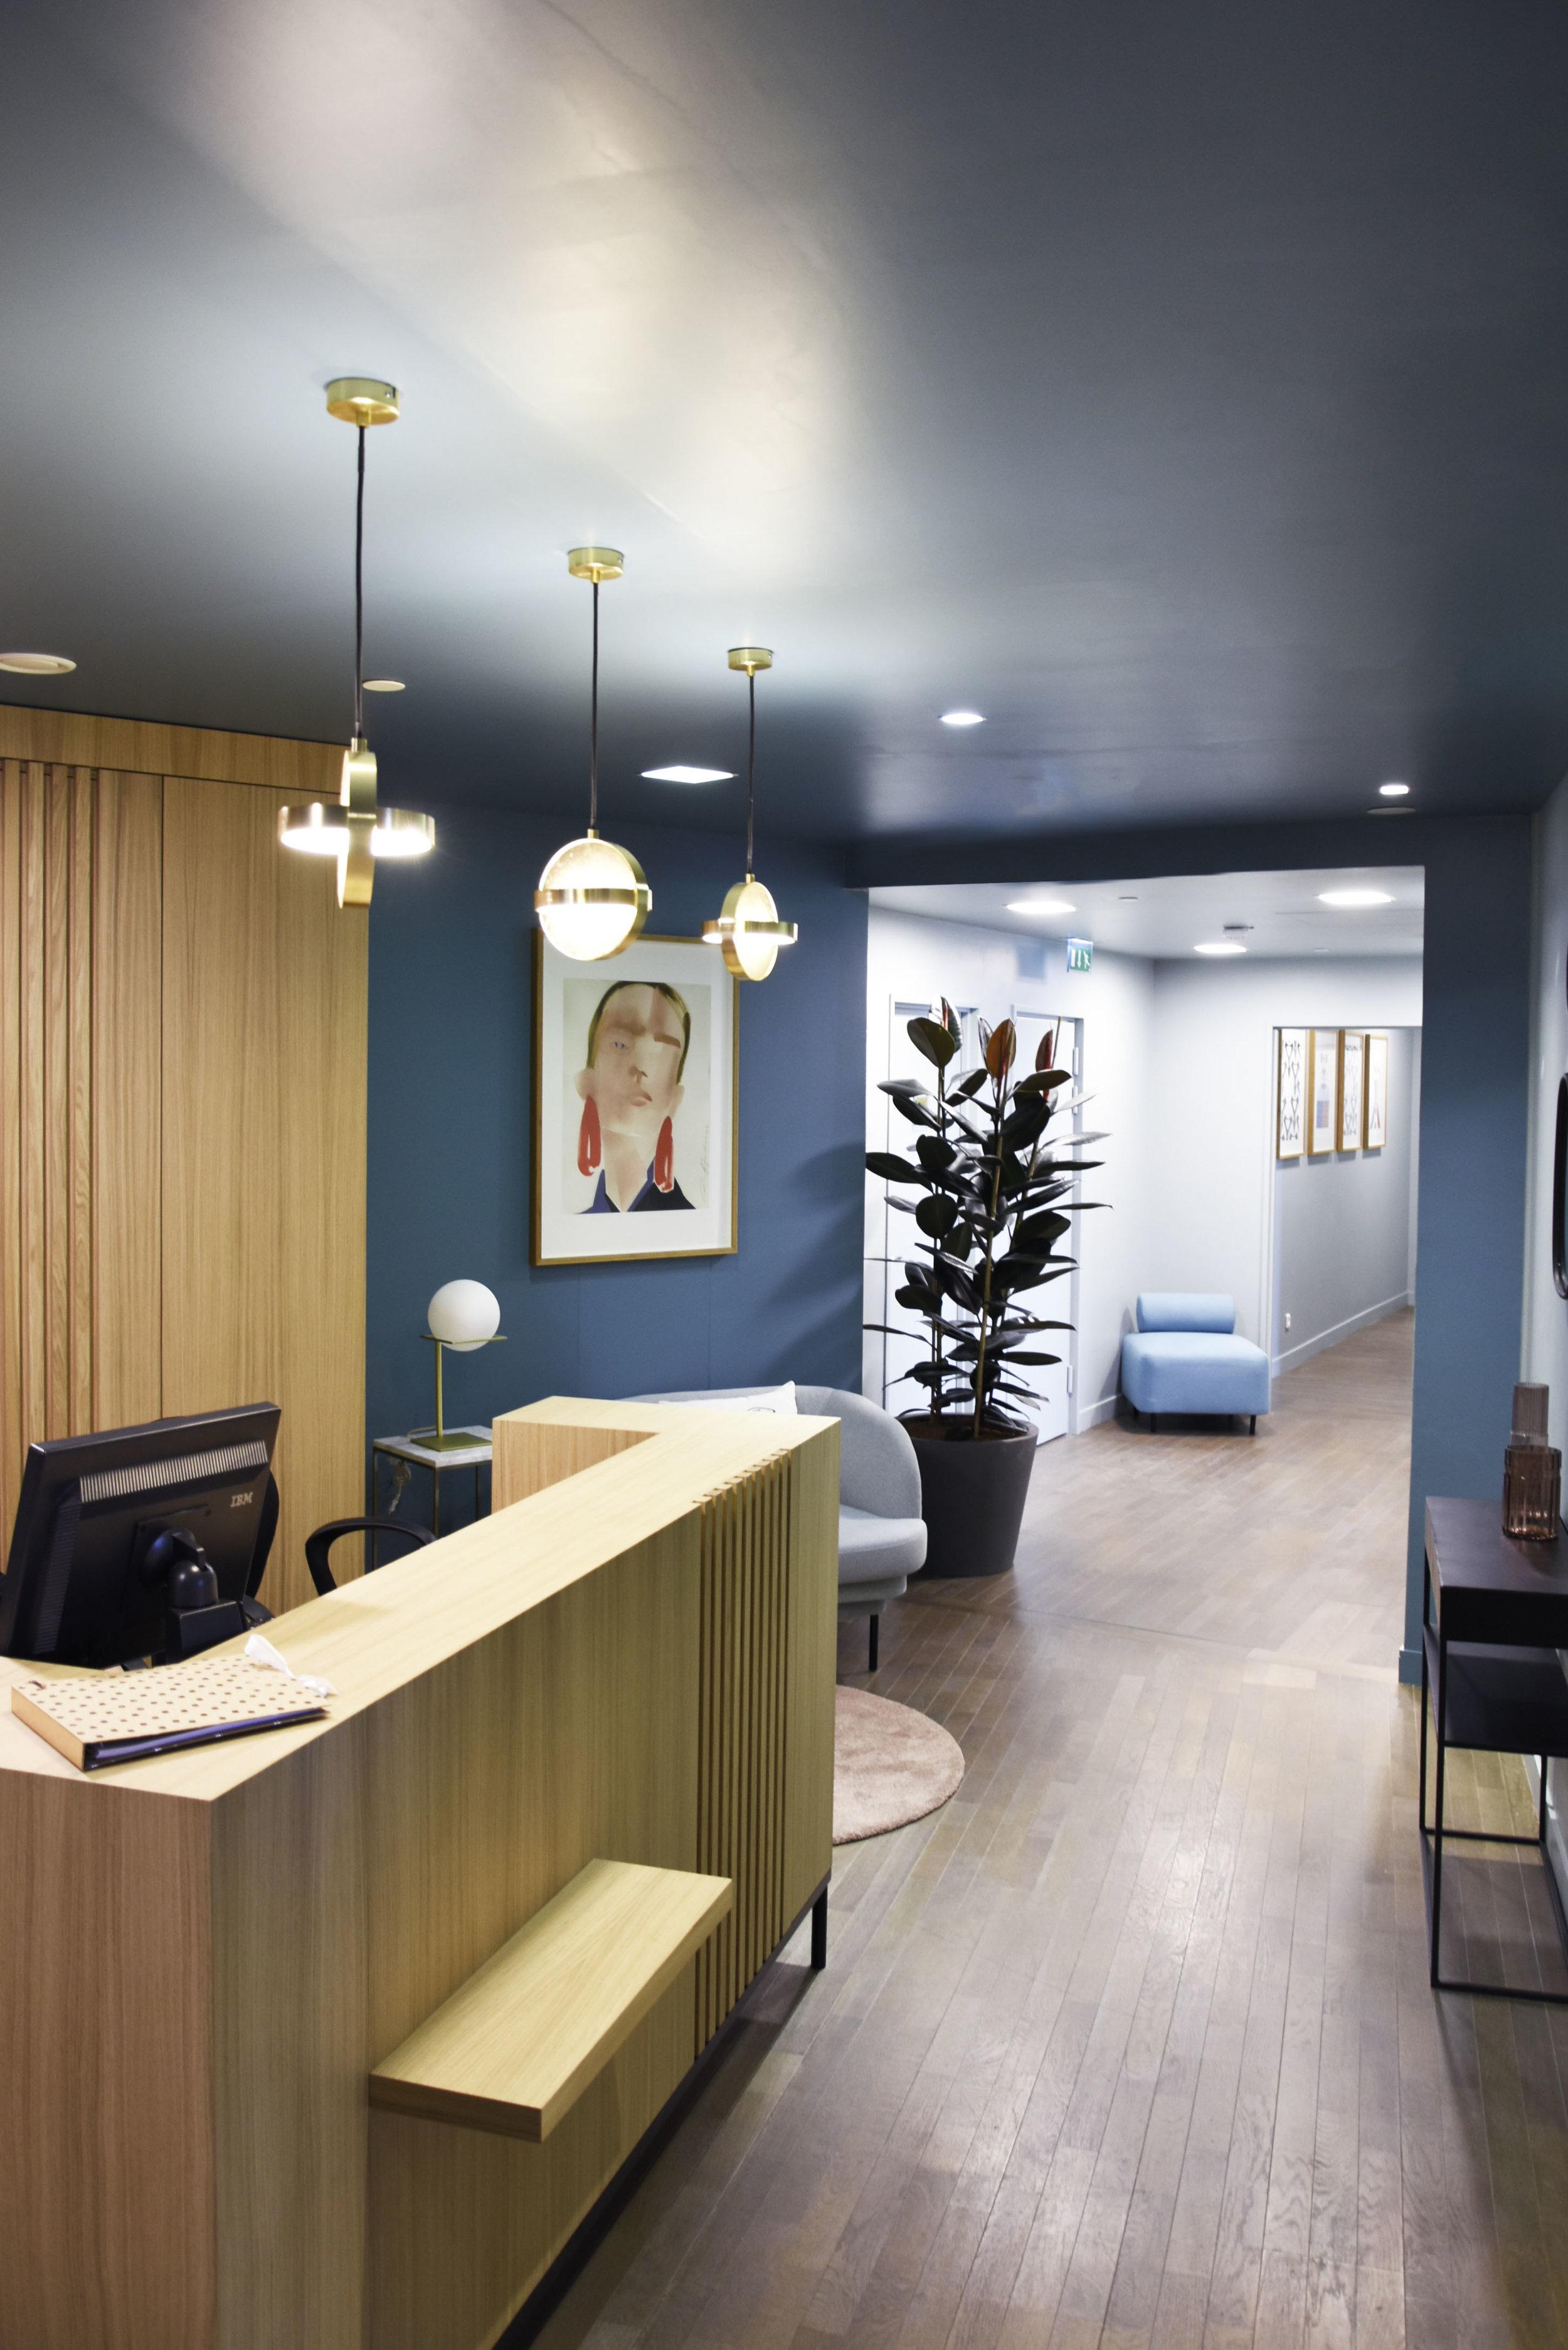 GALERIE LAFAYETTE espace client premium / PLUS pendant lamp, BOVARI pouf, GIN lamp